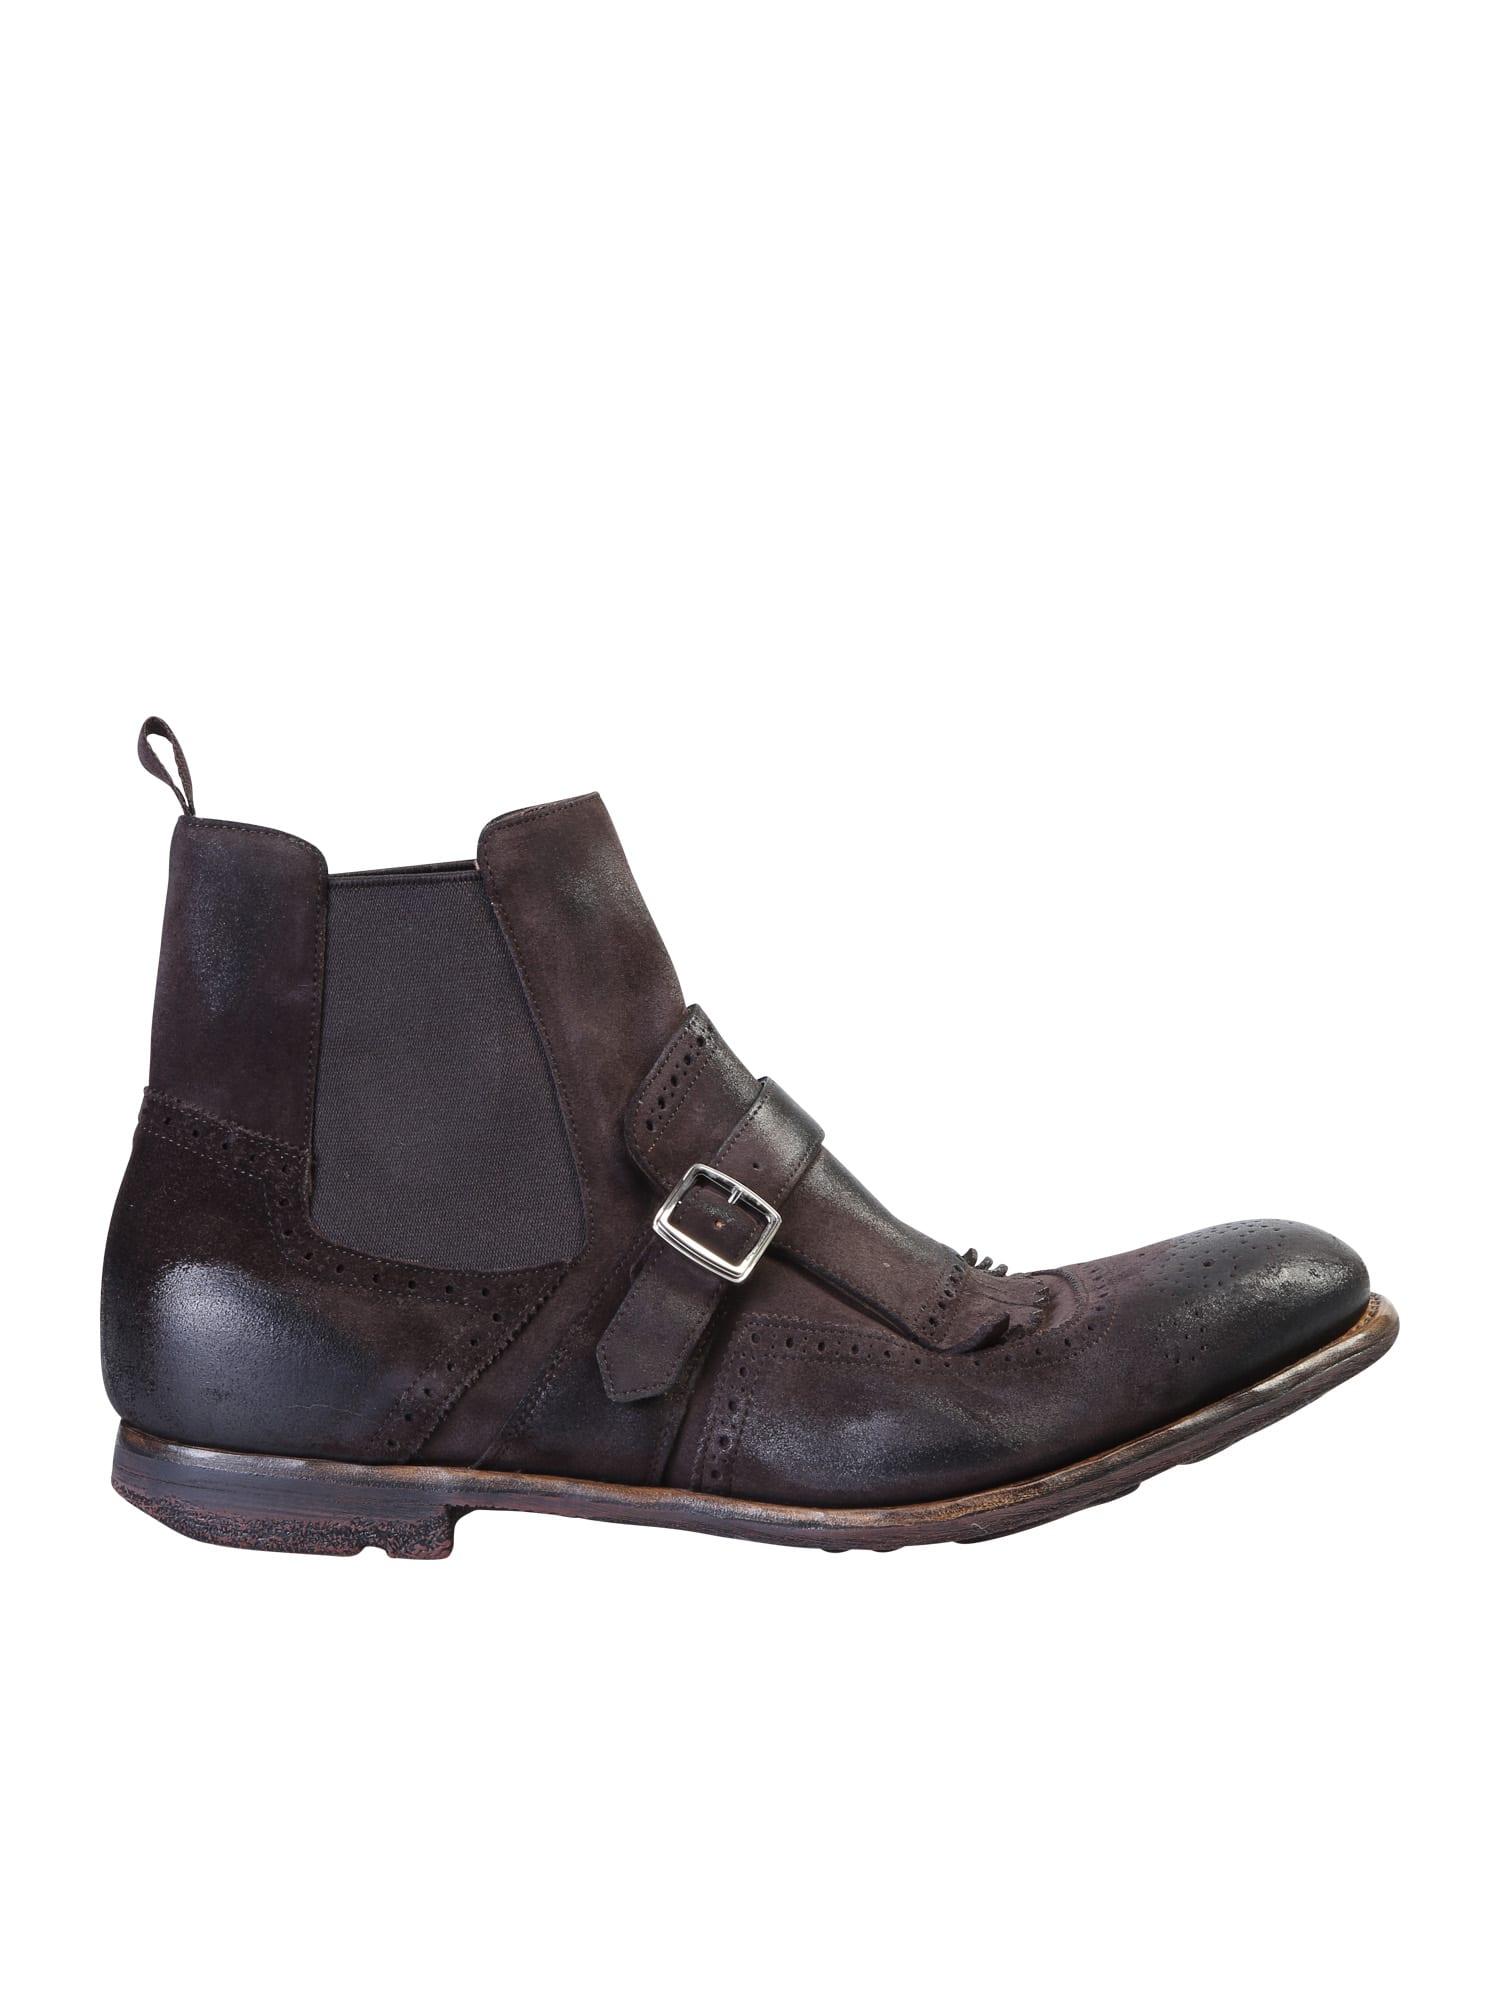 Churchs Shanghai Vintage Leather Boots